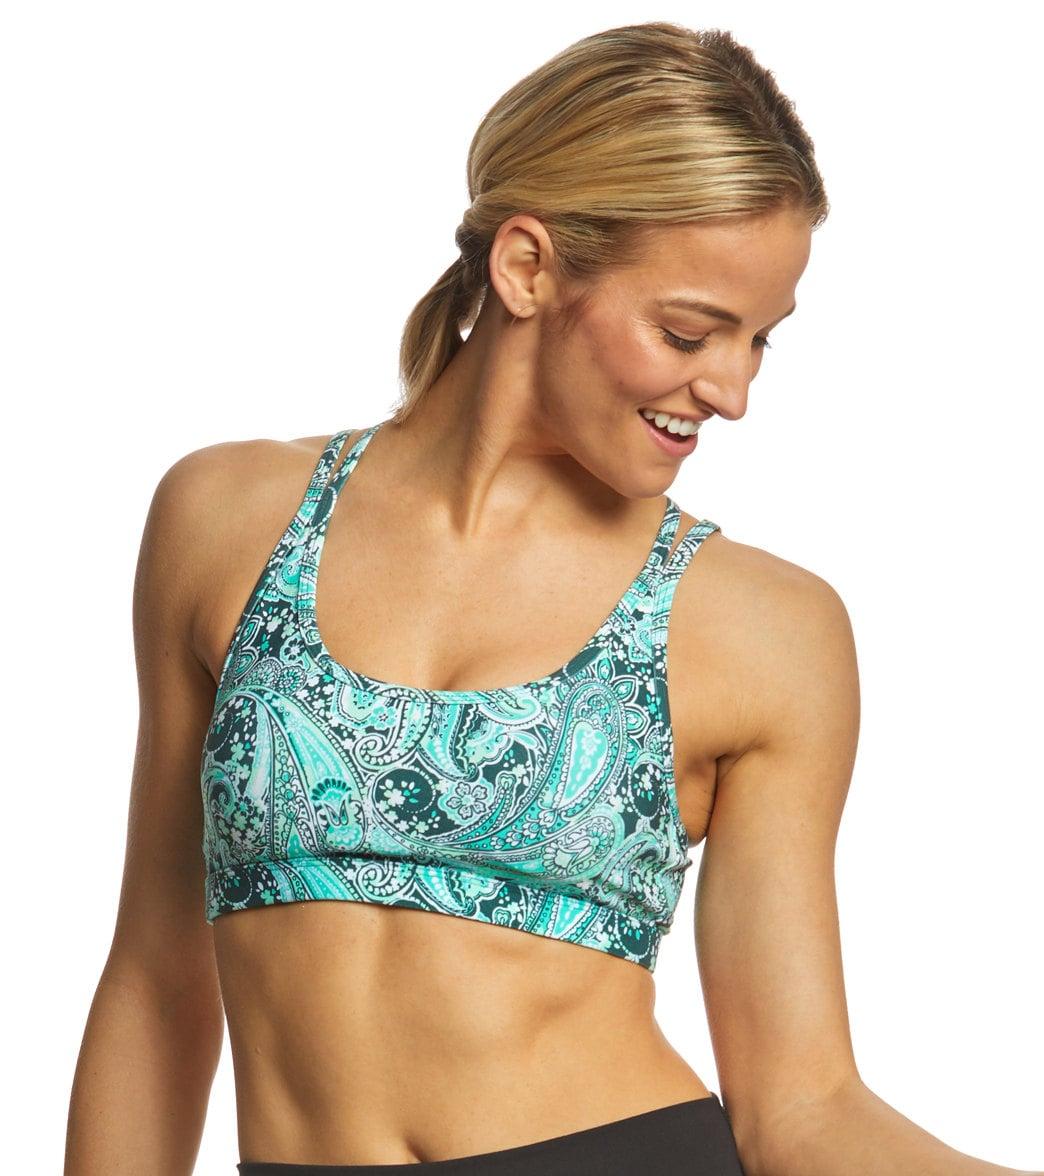 fe44a1fc03 Lorna Jane Paisley Dream Sports Bra at SwimOutlet.com - Free Shipping